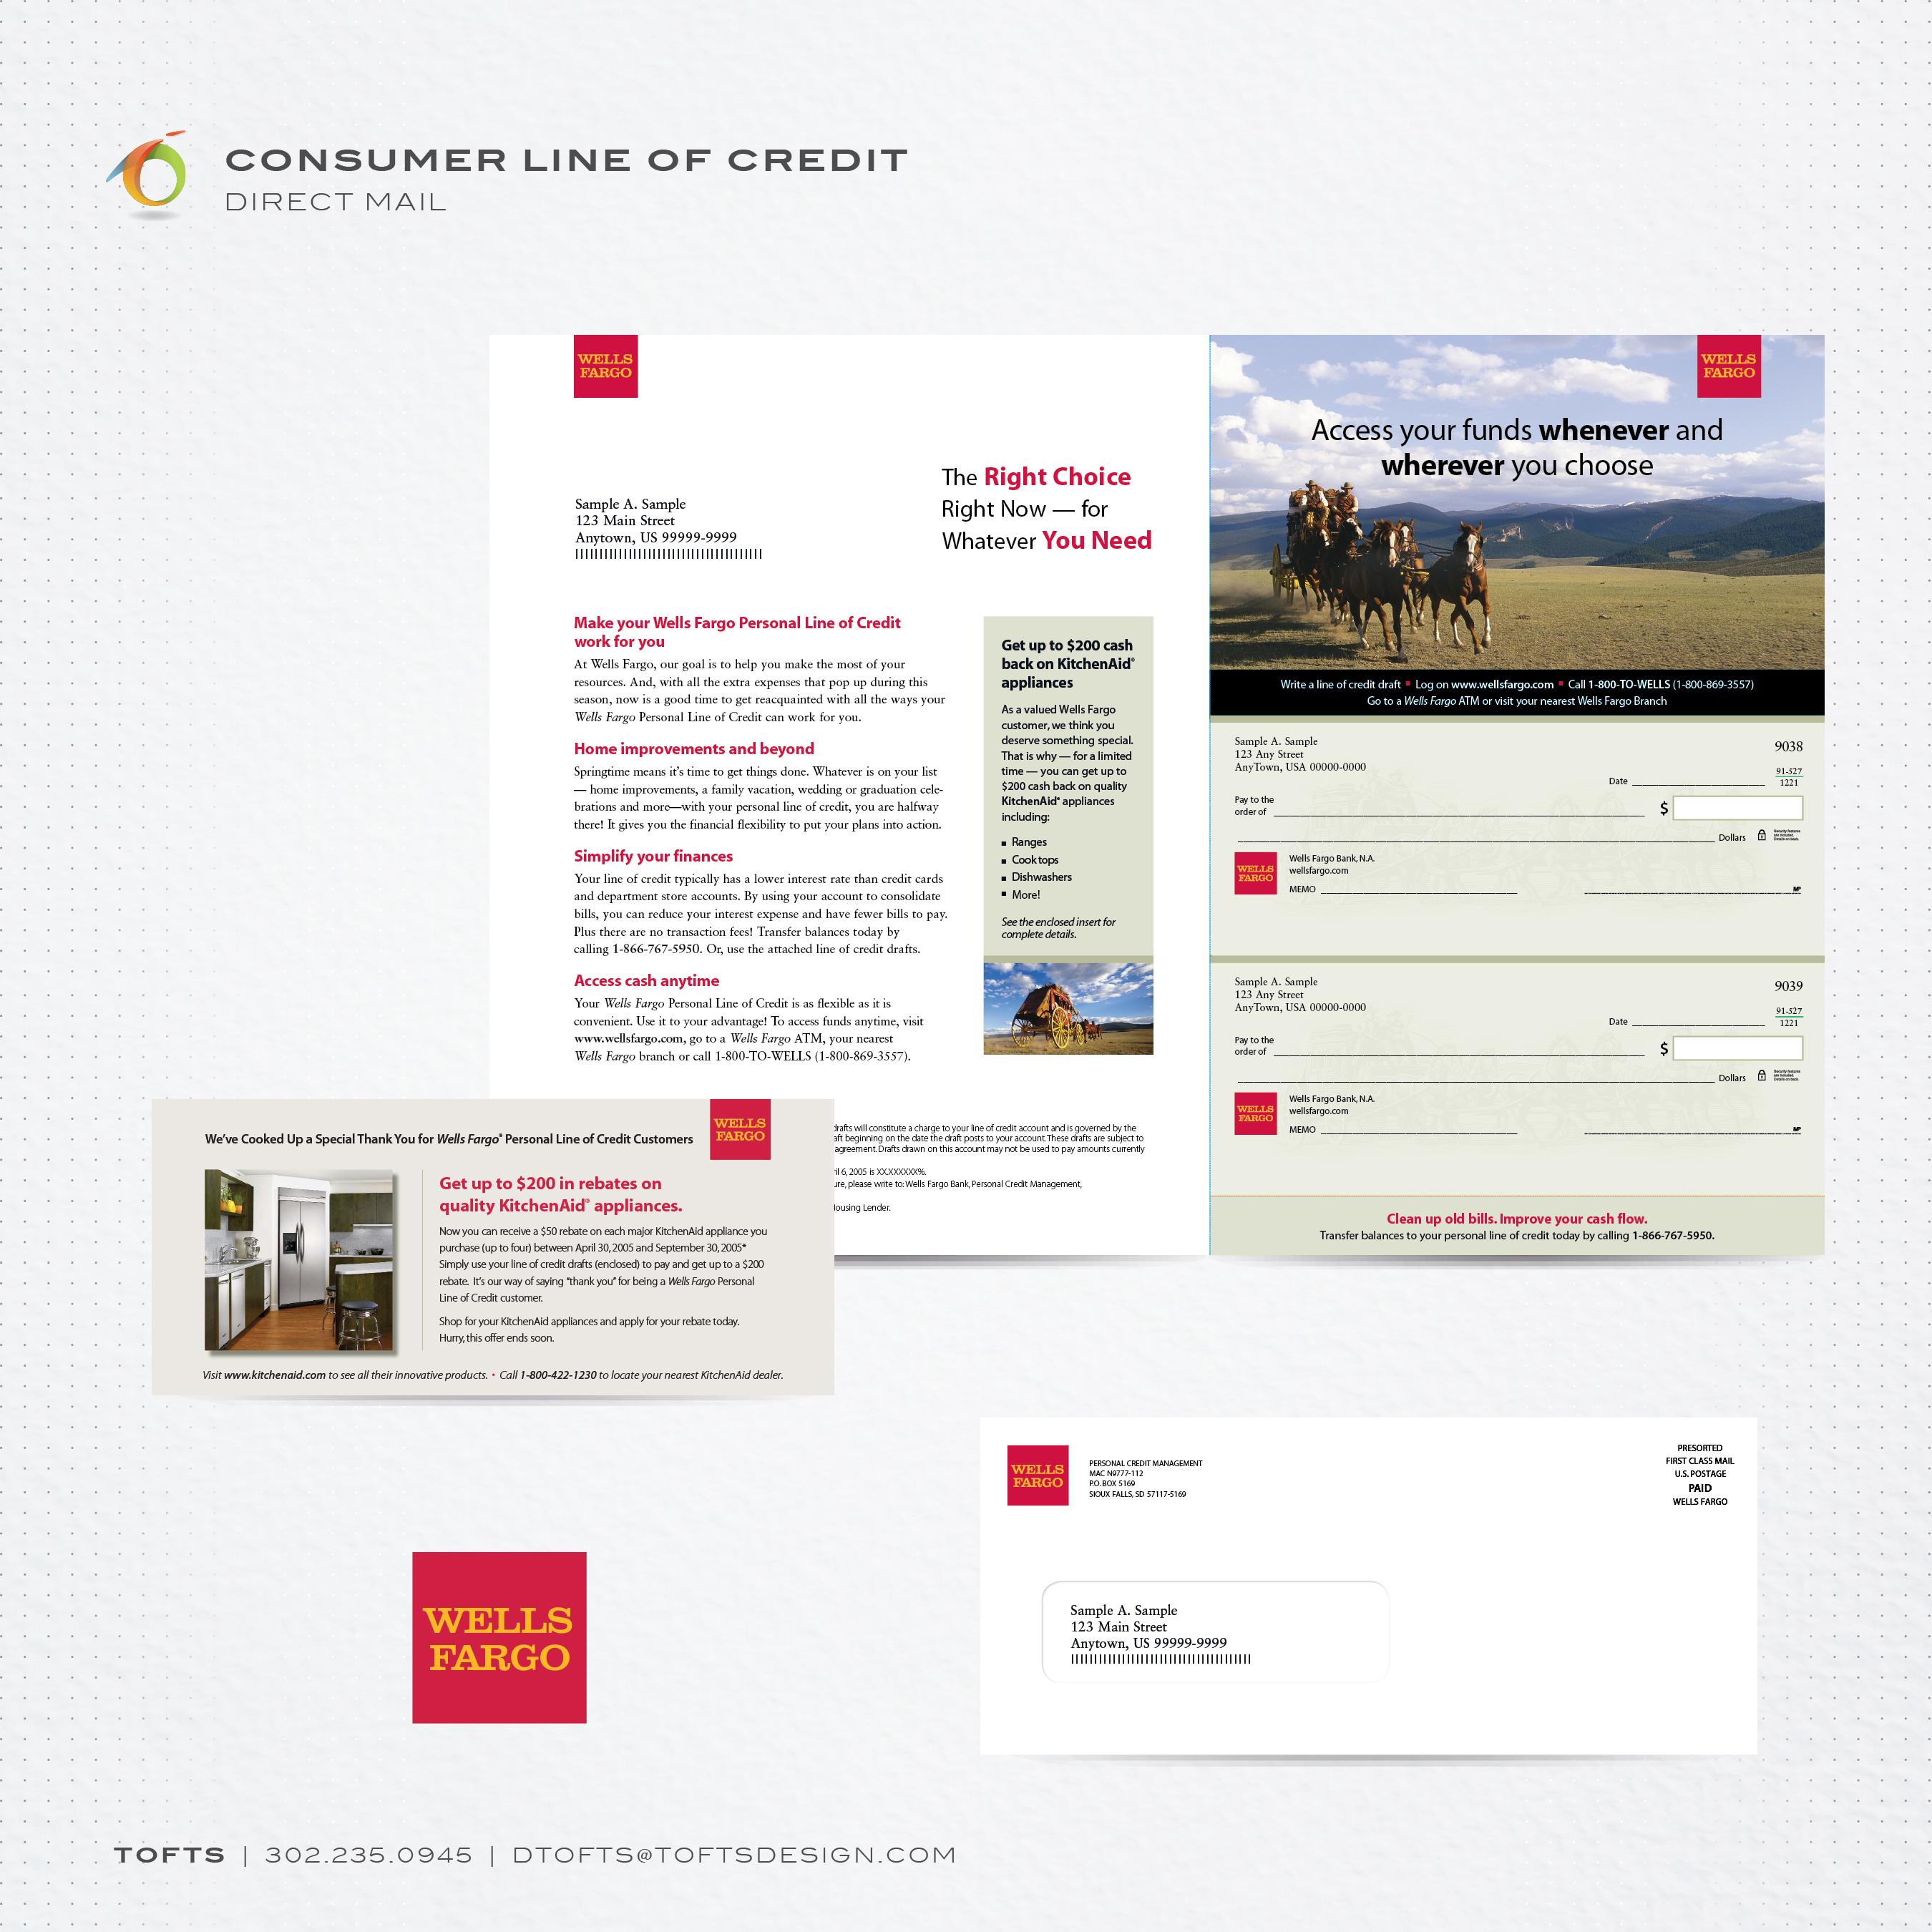 David Tofts - Consumer Direct Mail